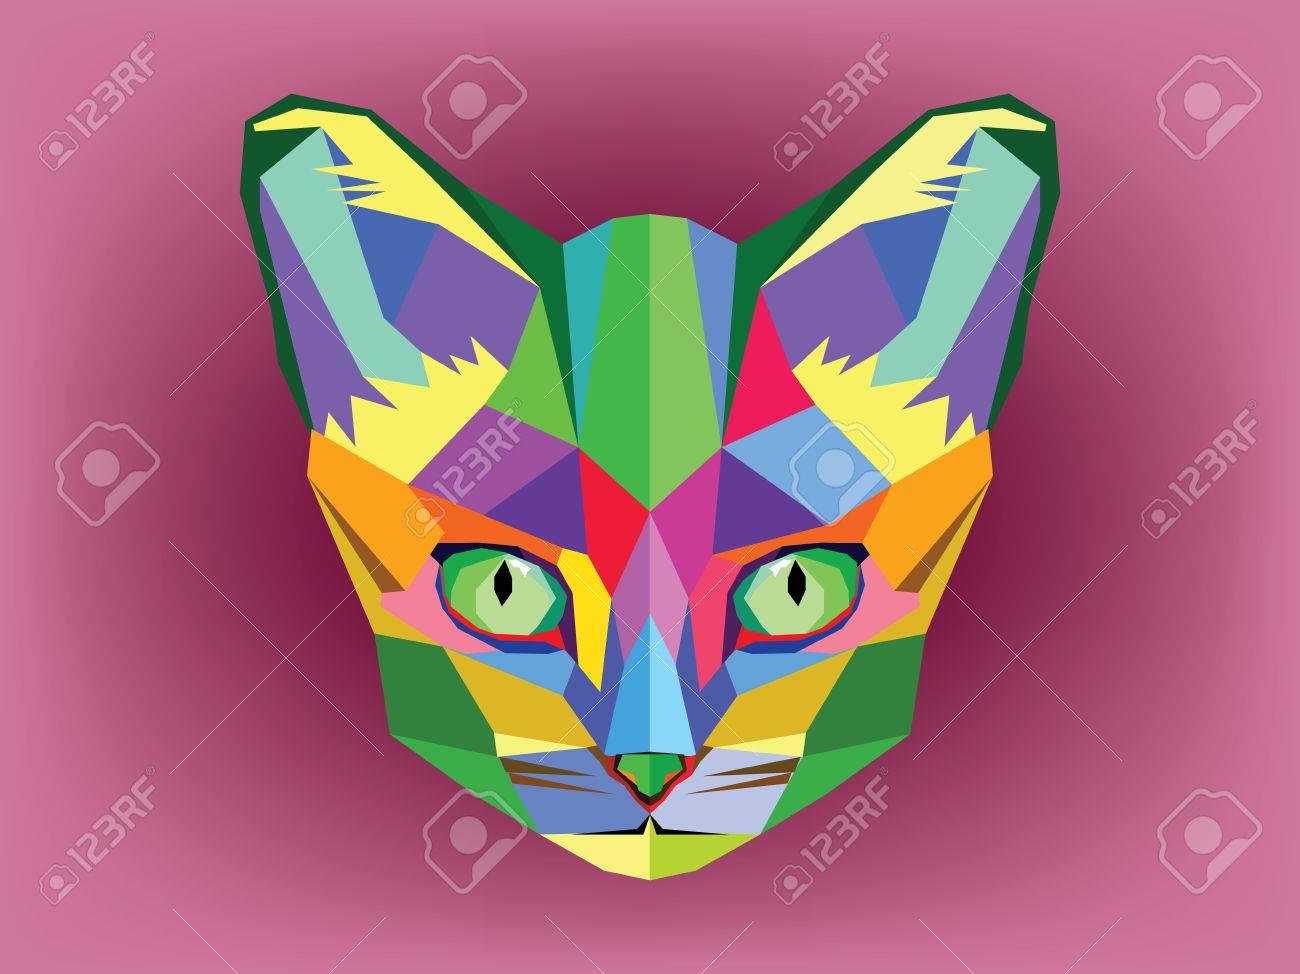 Geometric Cat Head Cat Head With Geometric Style